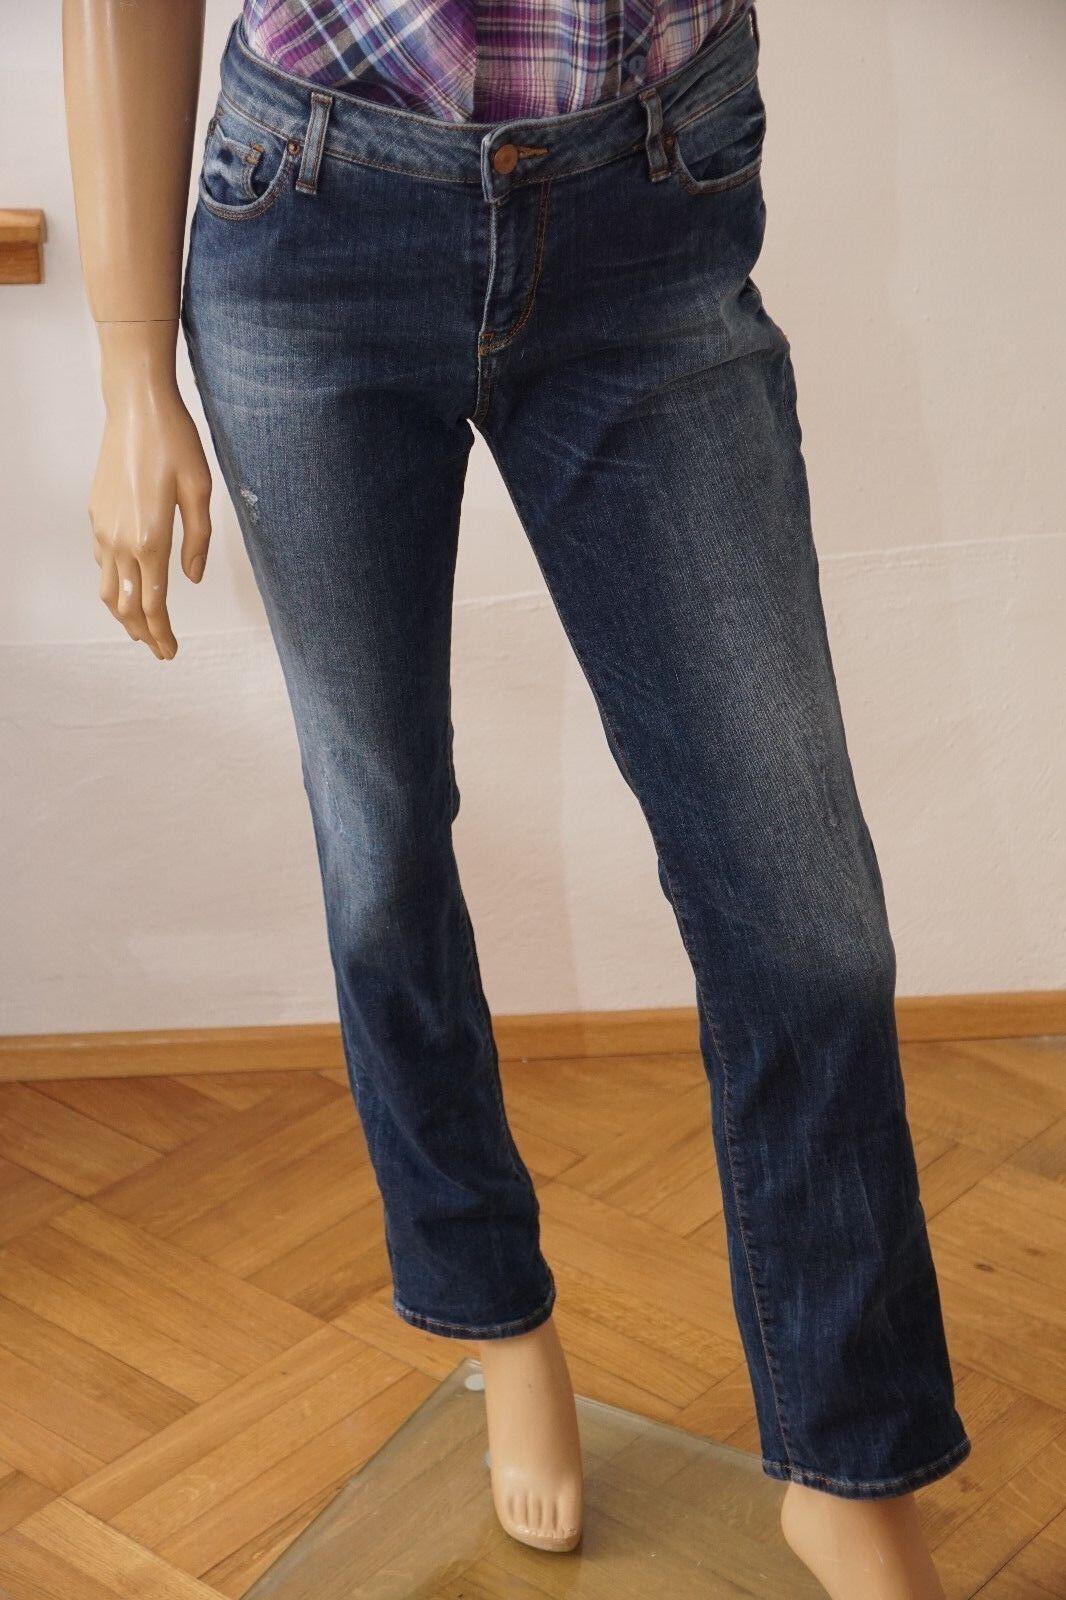 ESPRIT Jeans Jeanshose Damen blau Größe 40 (1801D-BR-OH3 ) ) ) | Große Ausverkauf  7755bf